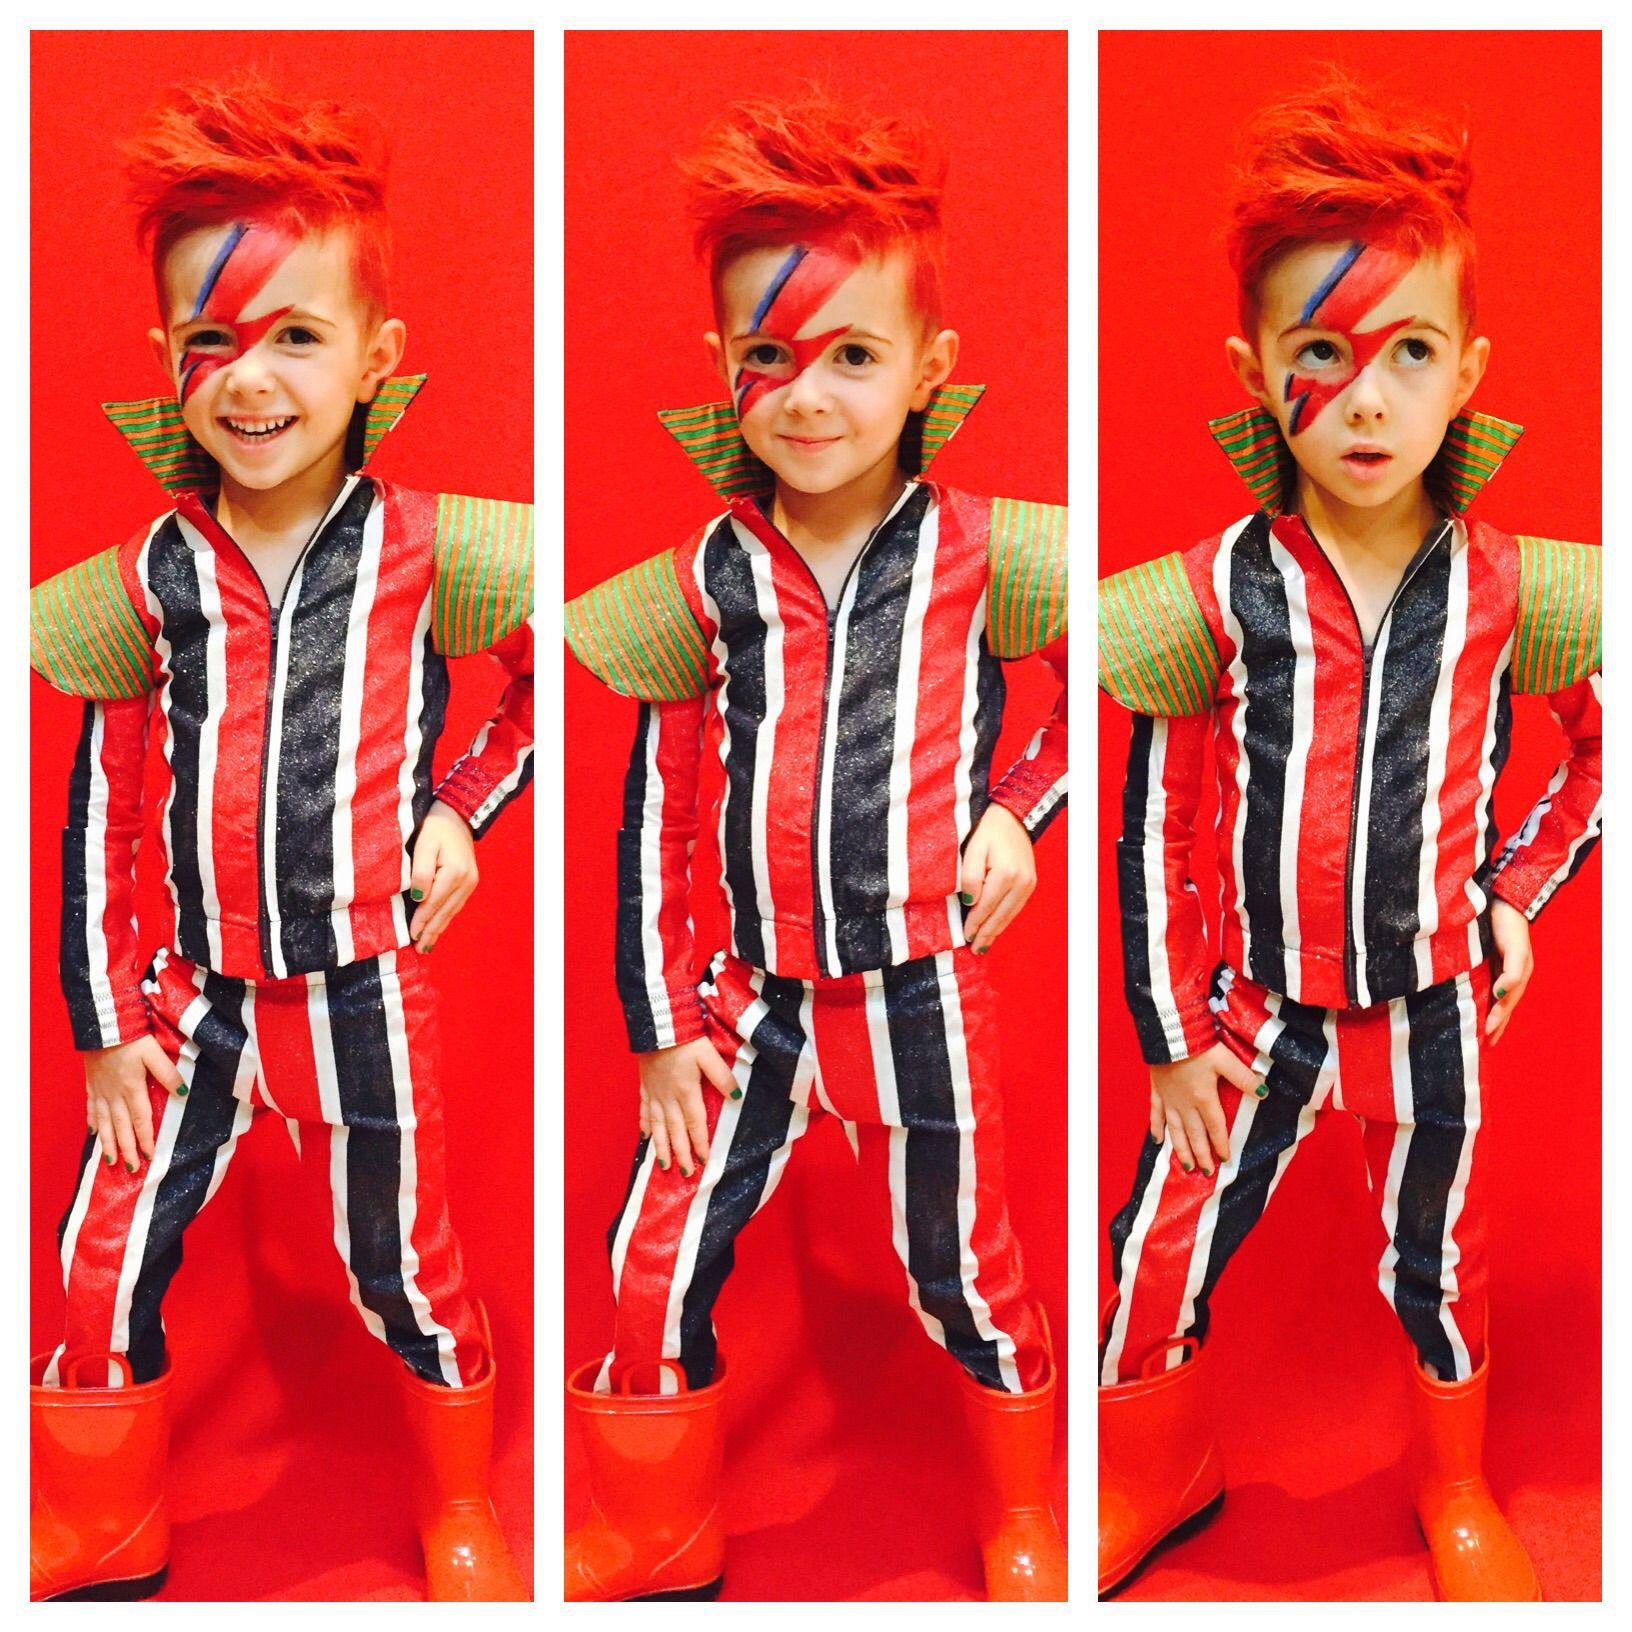 Kids David Bowie / Ziggy Stardust Halloween Costume!   sew ...